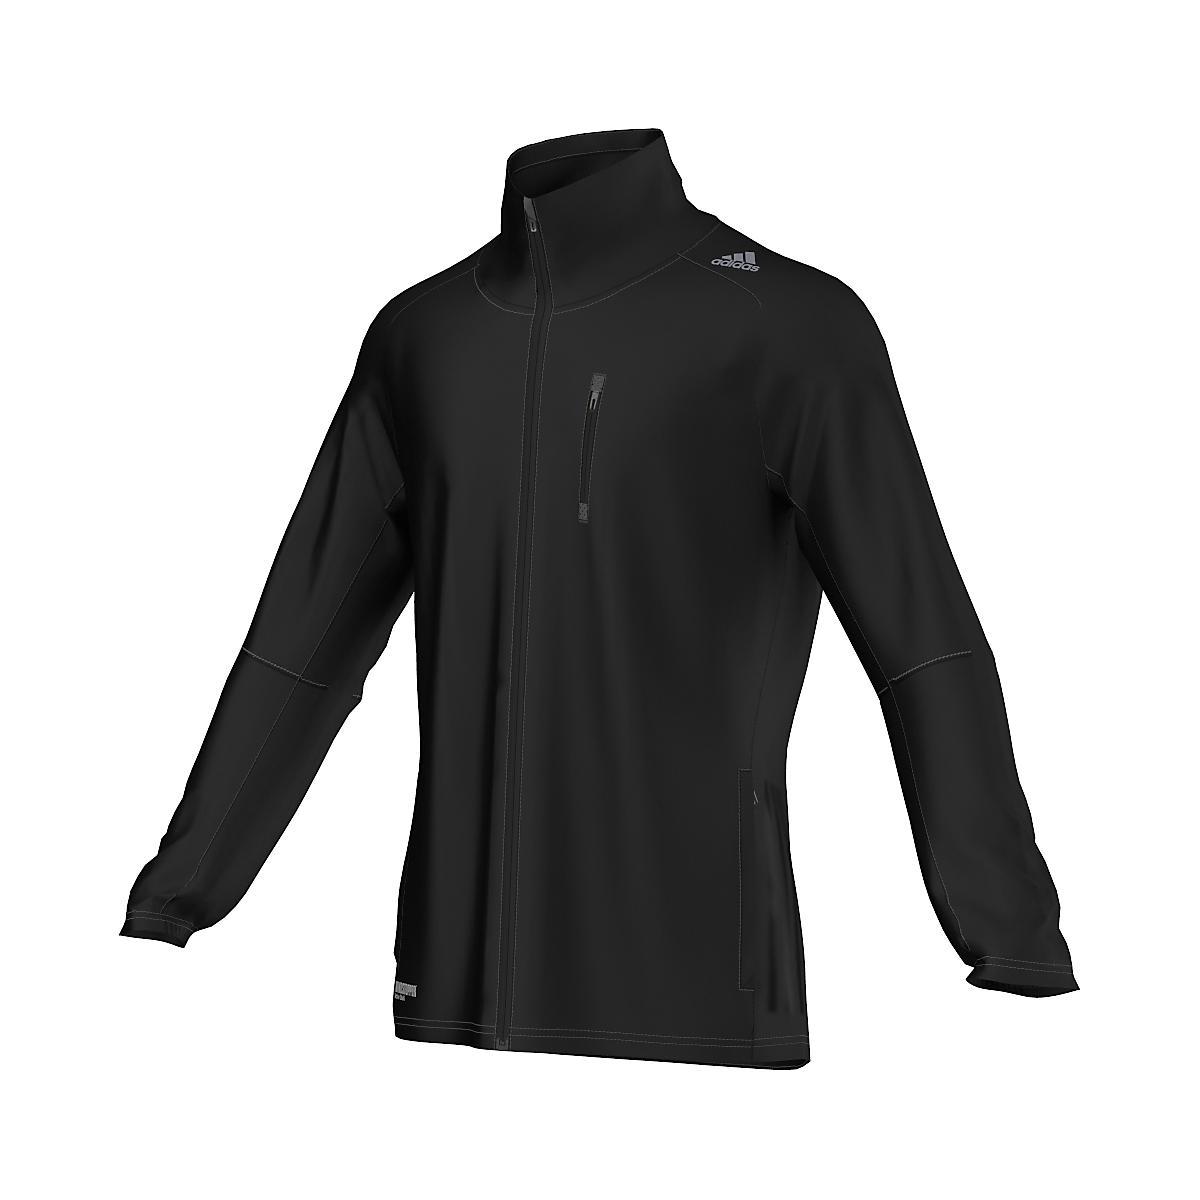 Adidas Men's Supernova Gore Windstopper Jacket